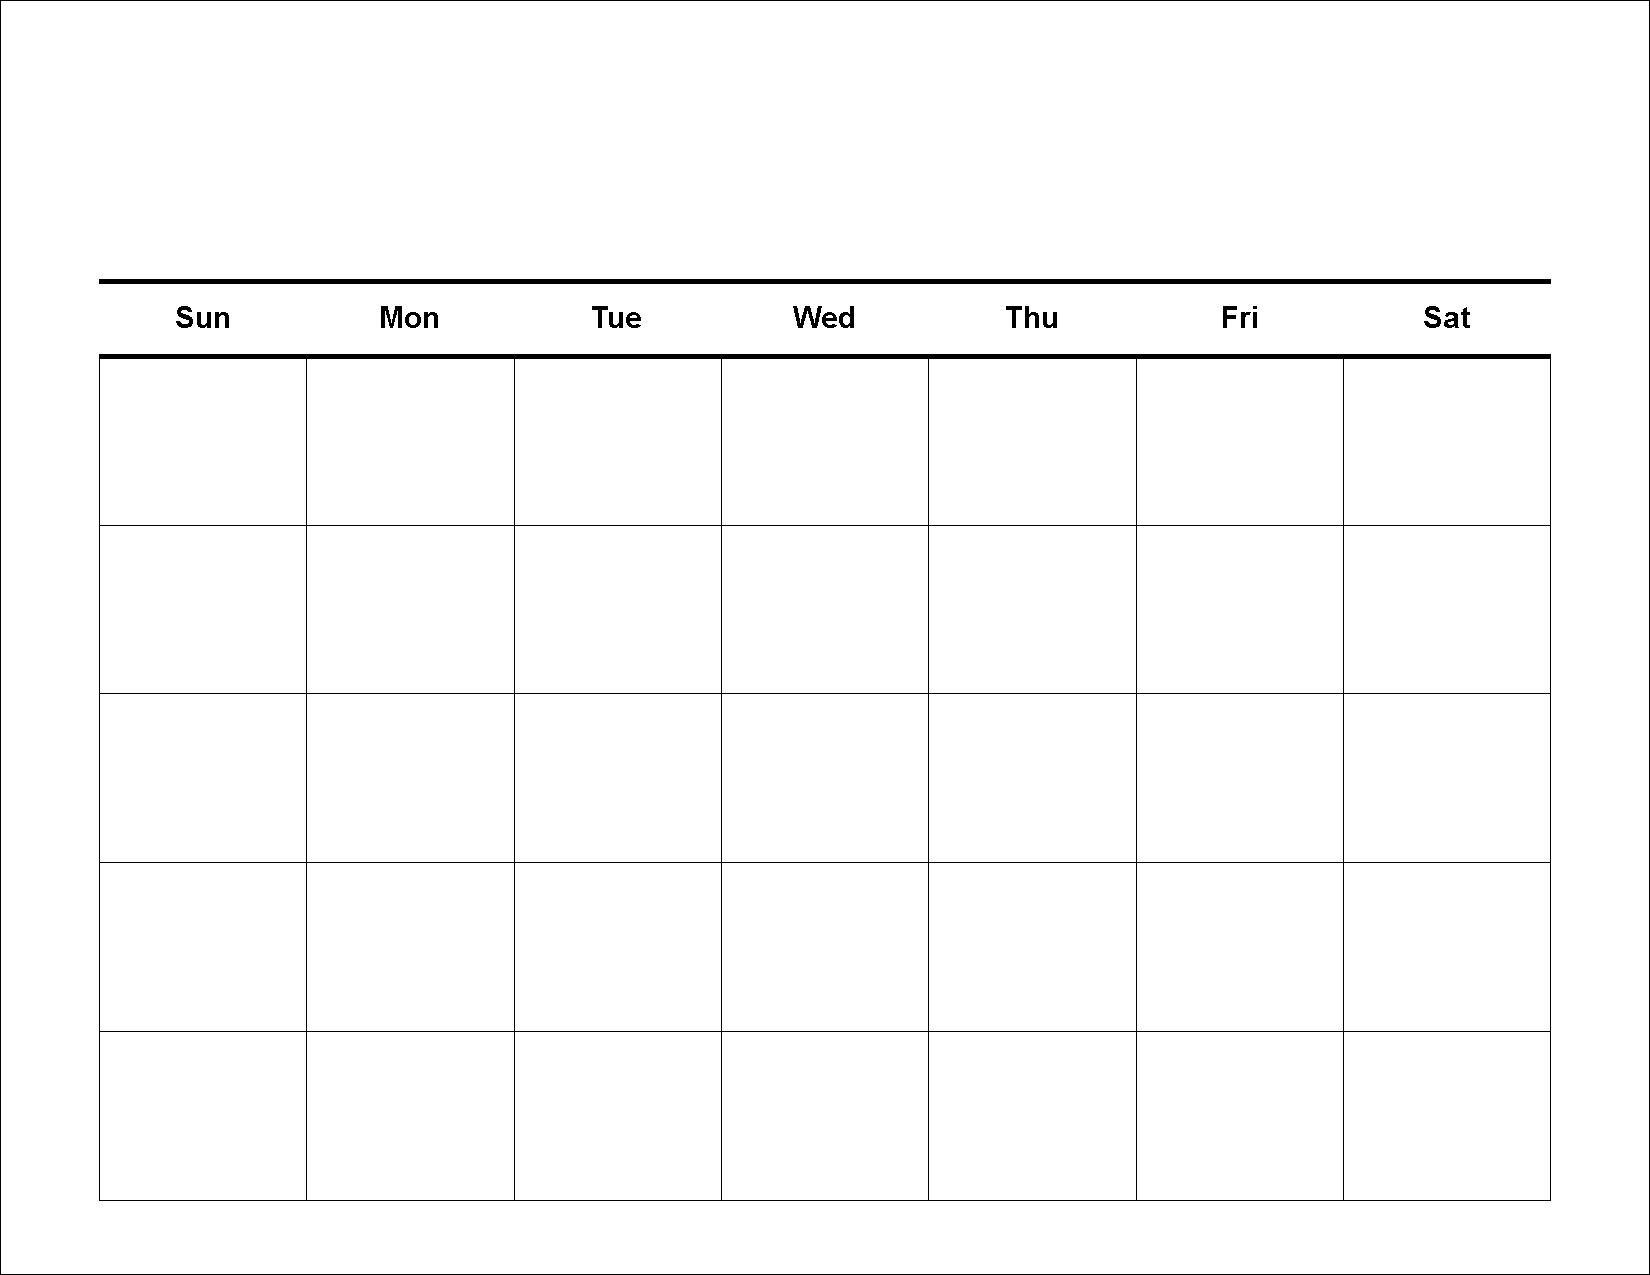 30-Day-Calendar-Template-Printable-Large regarding Free Printable 5 Day Calendar Pages